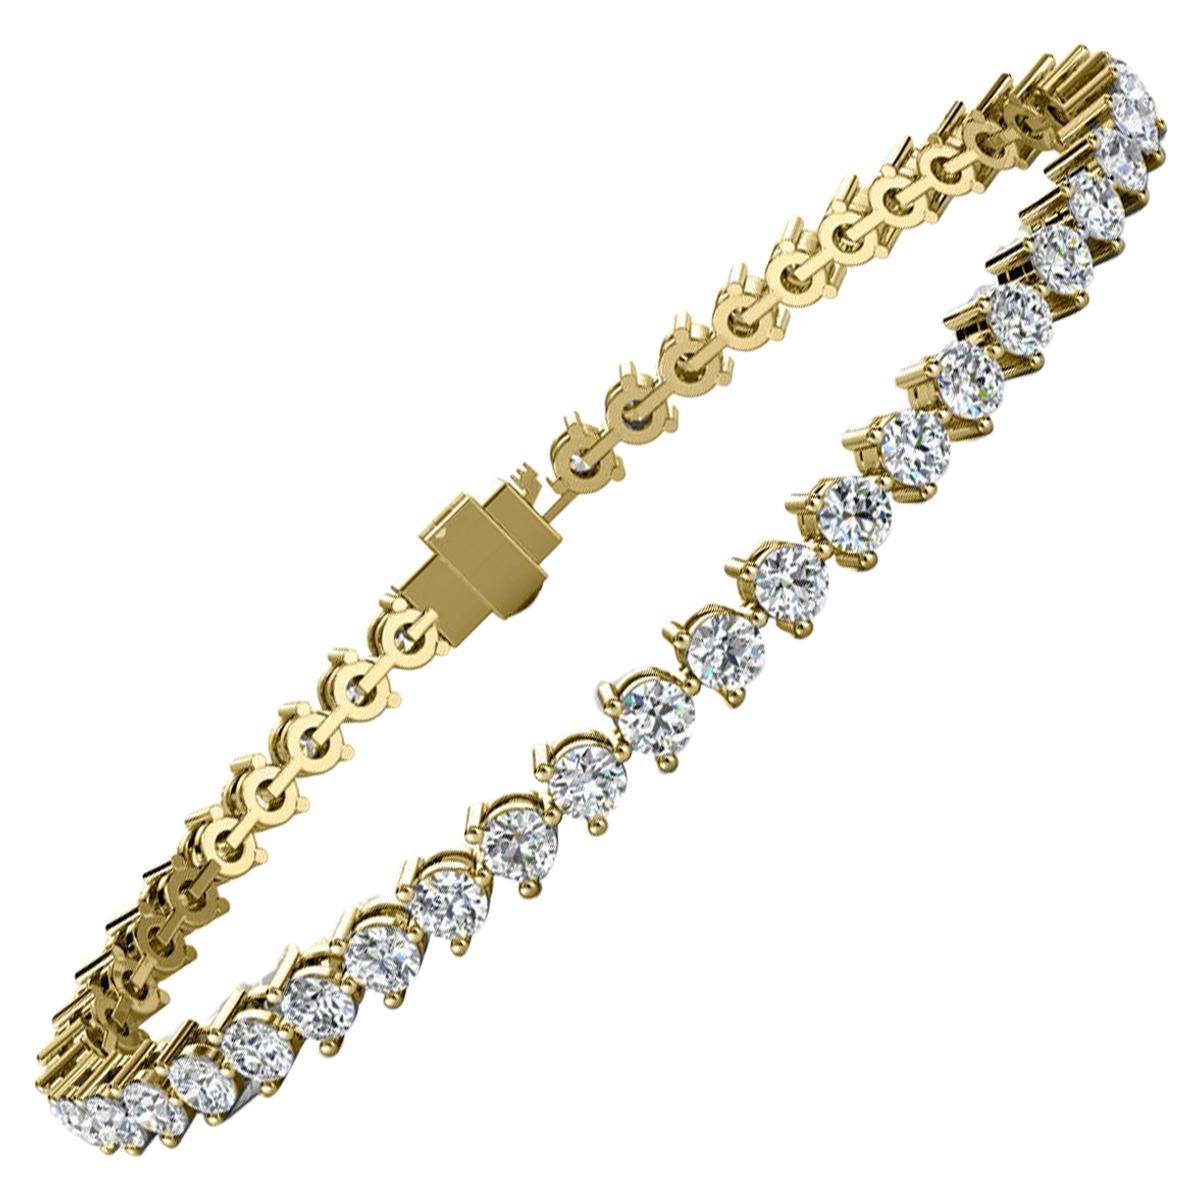 14 Karat Yellow Gold Three Prongs Diamond Tennis Bracelet '5 Carat'